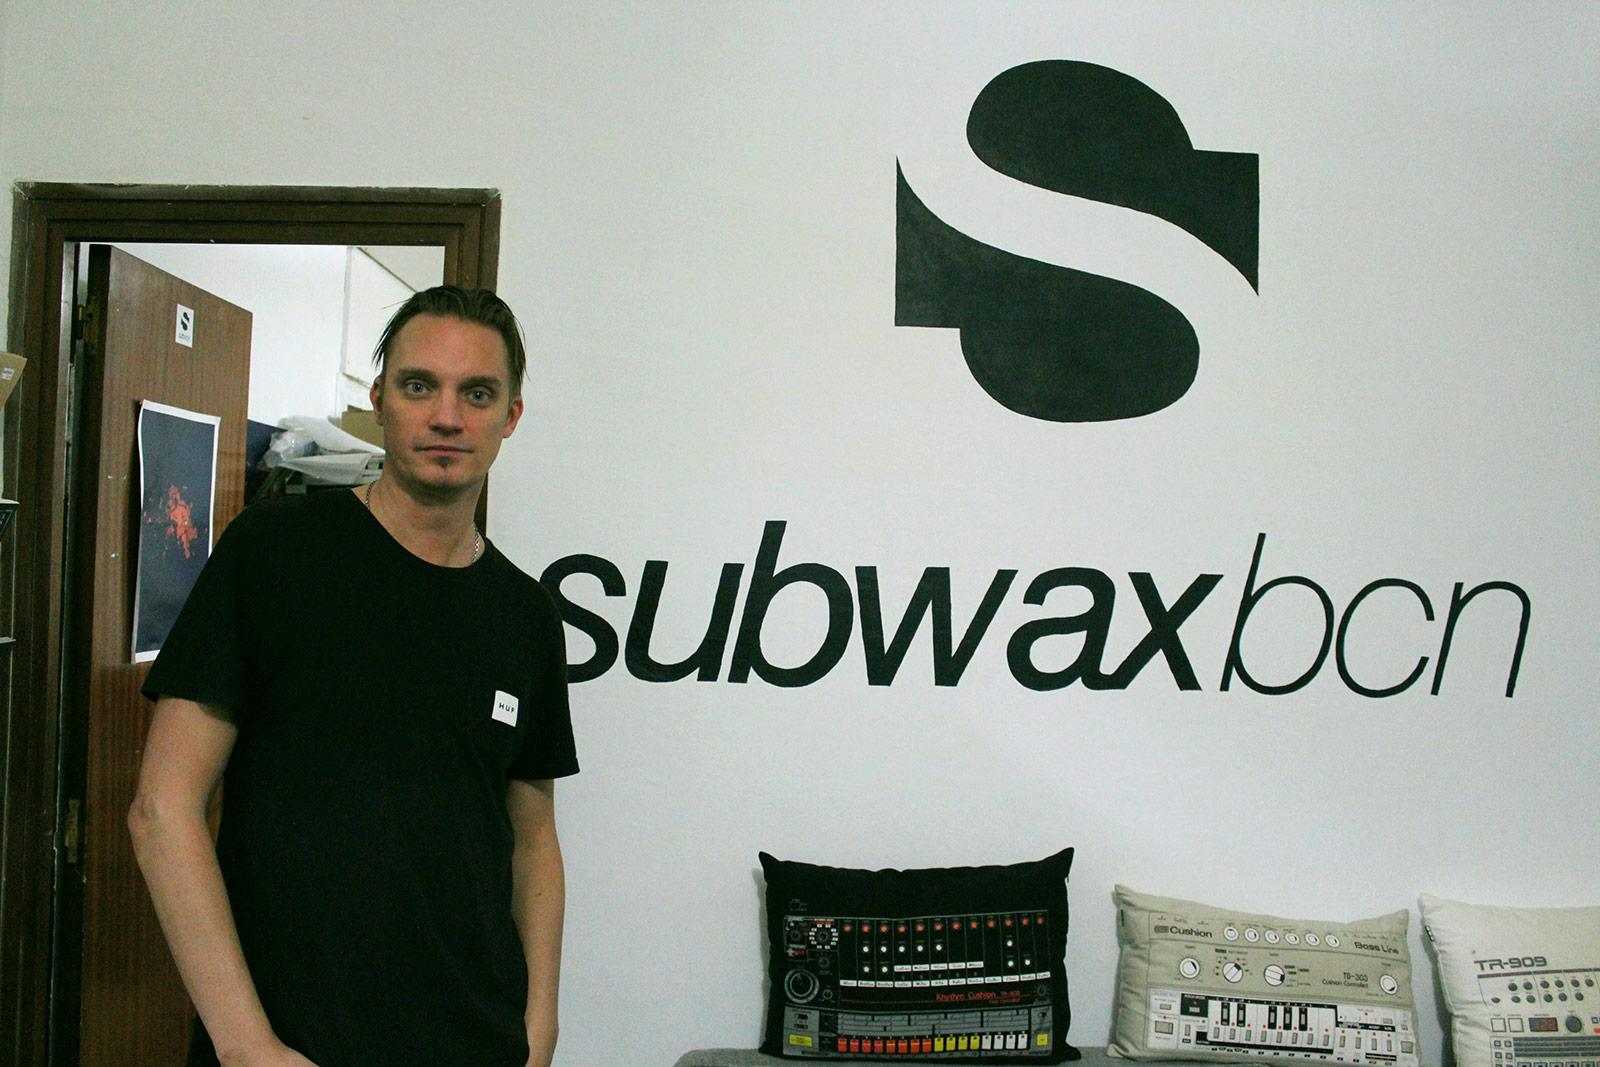 Subwaxbcn metalmagazine